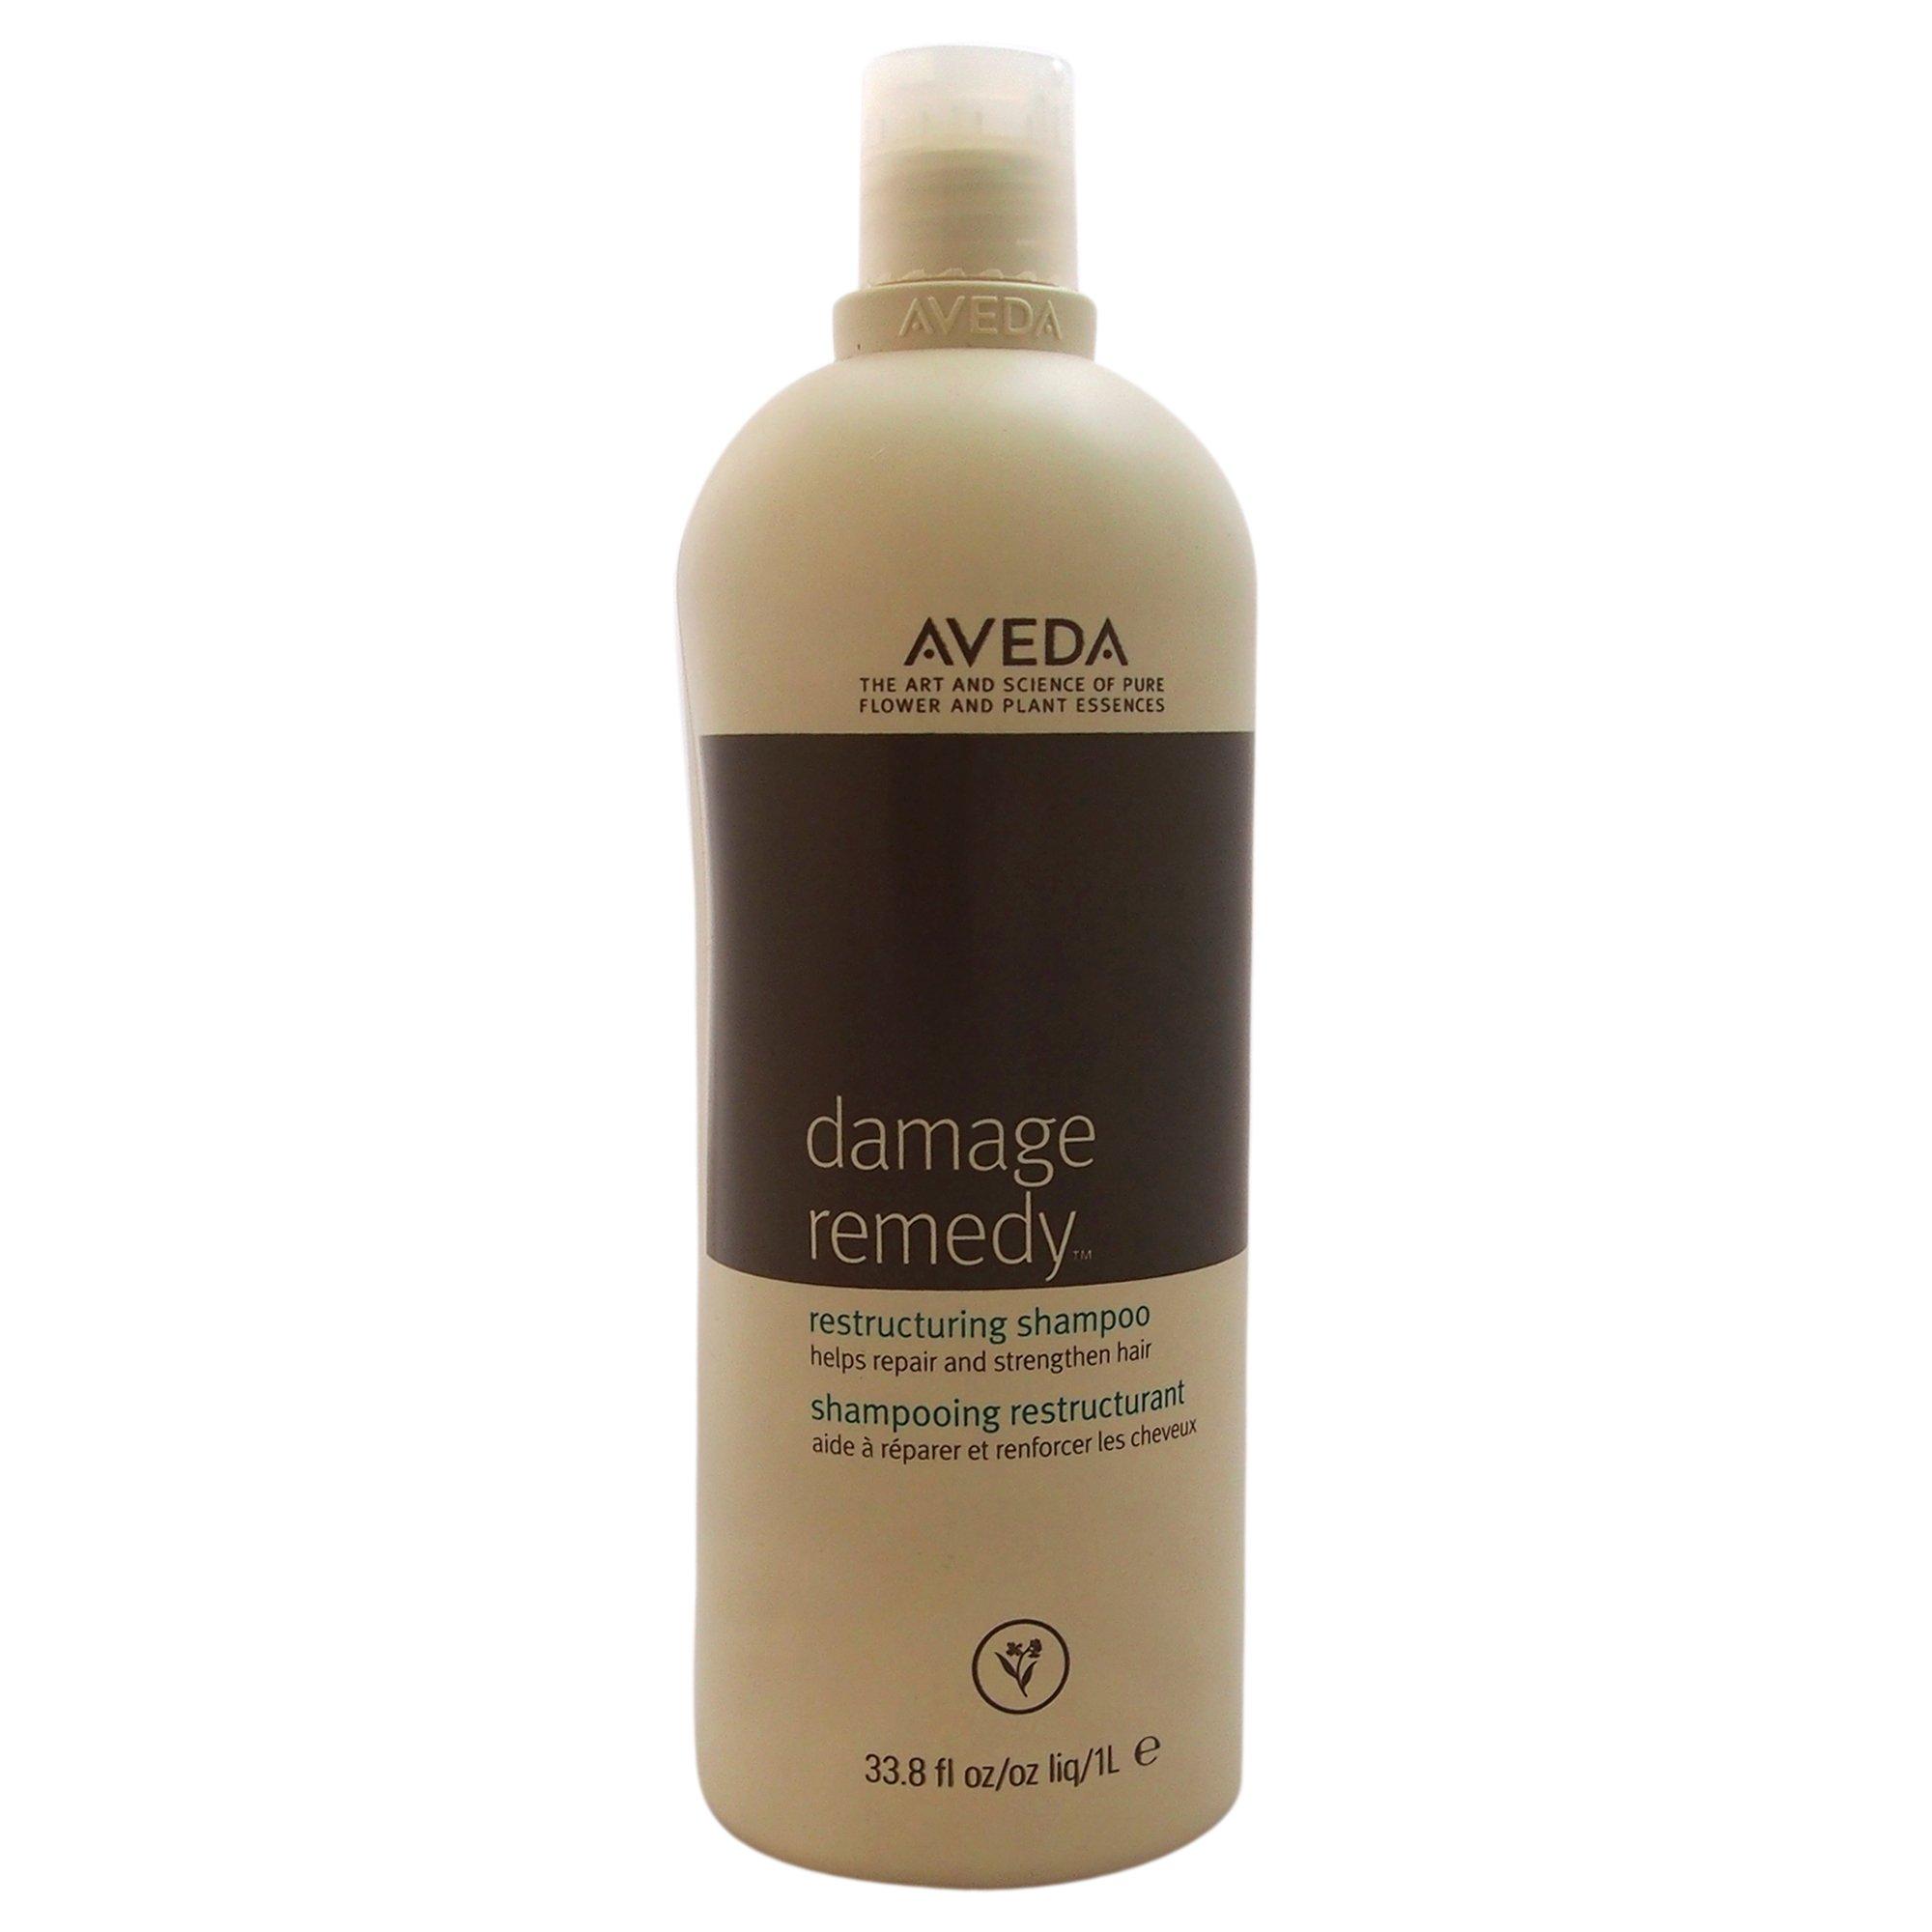 how to use aveda damage remedy